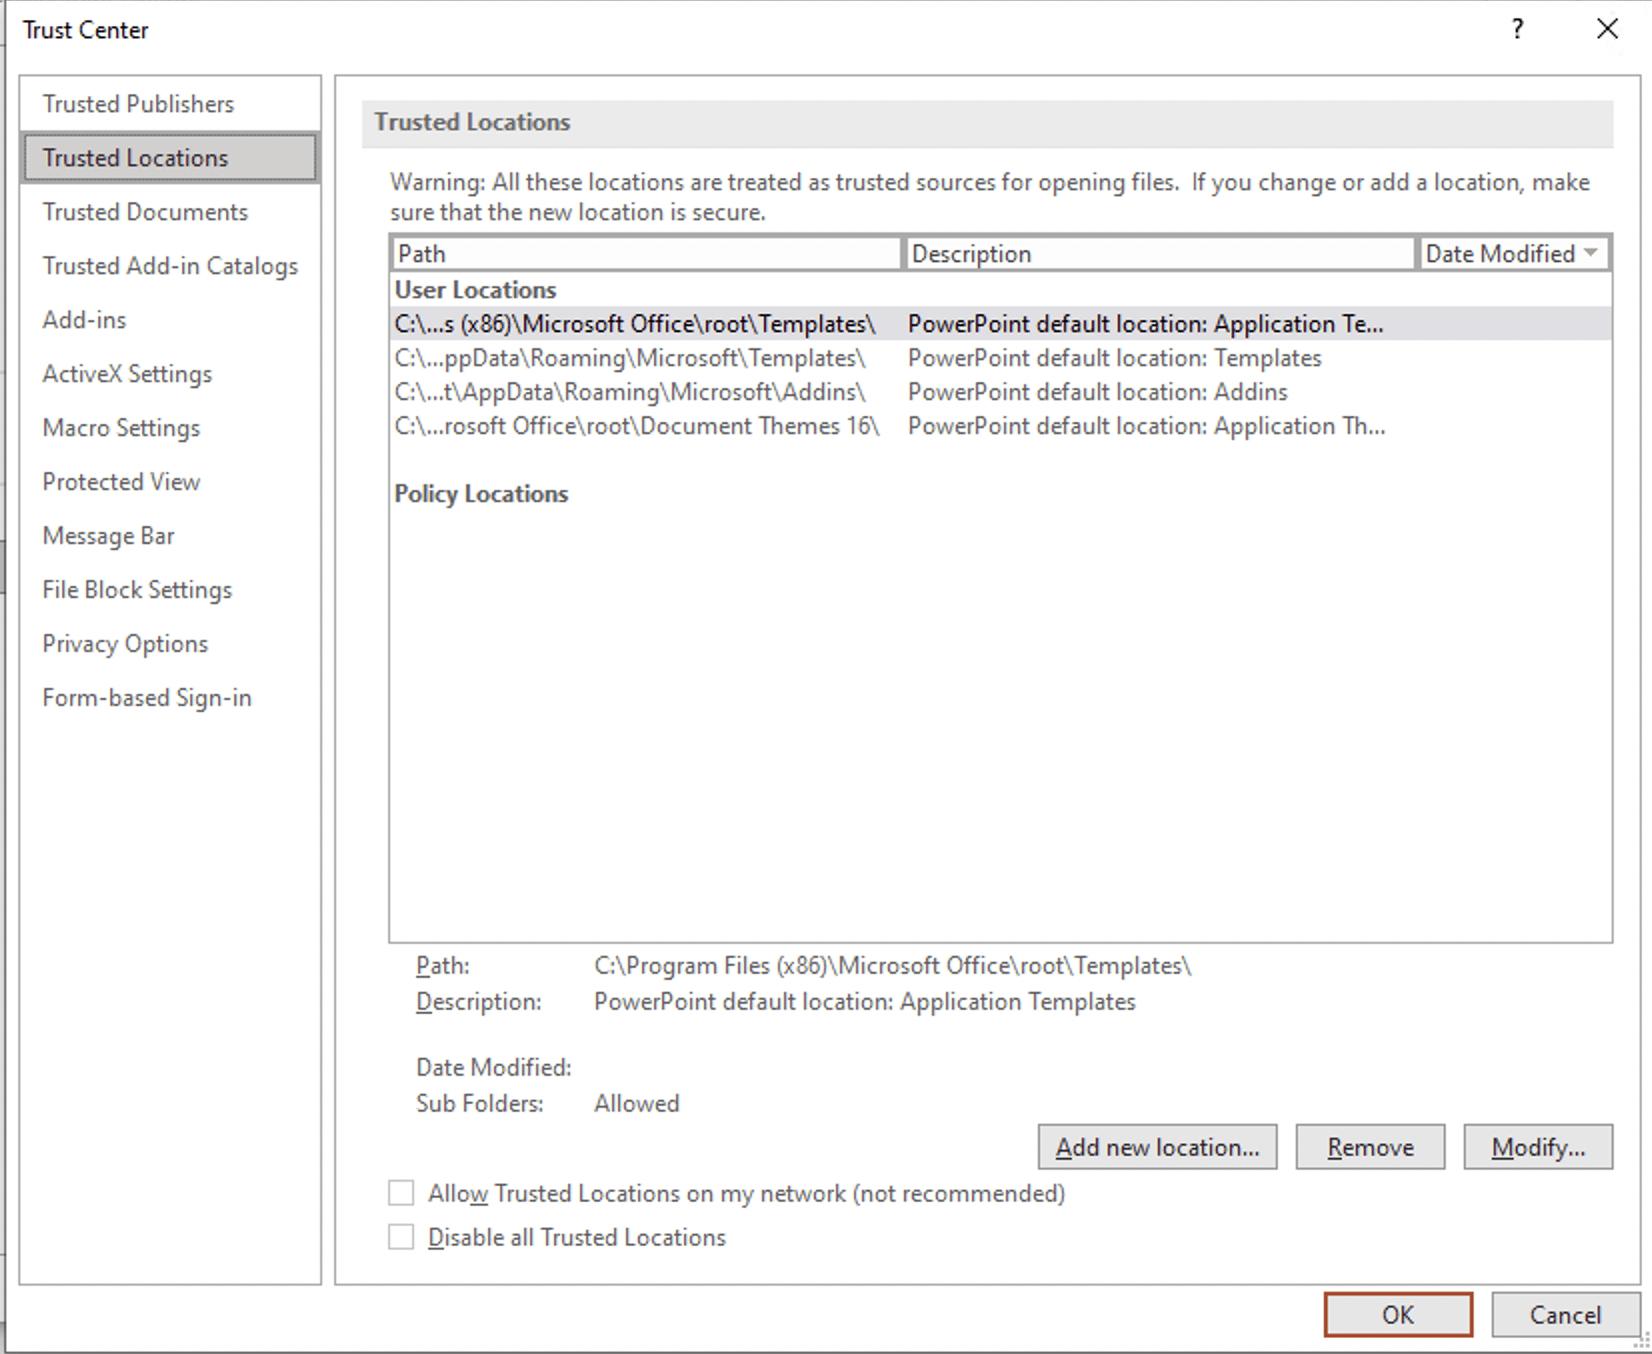 Microsoft 365 - Trust center settings